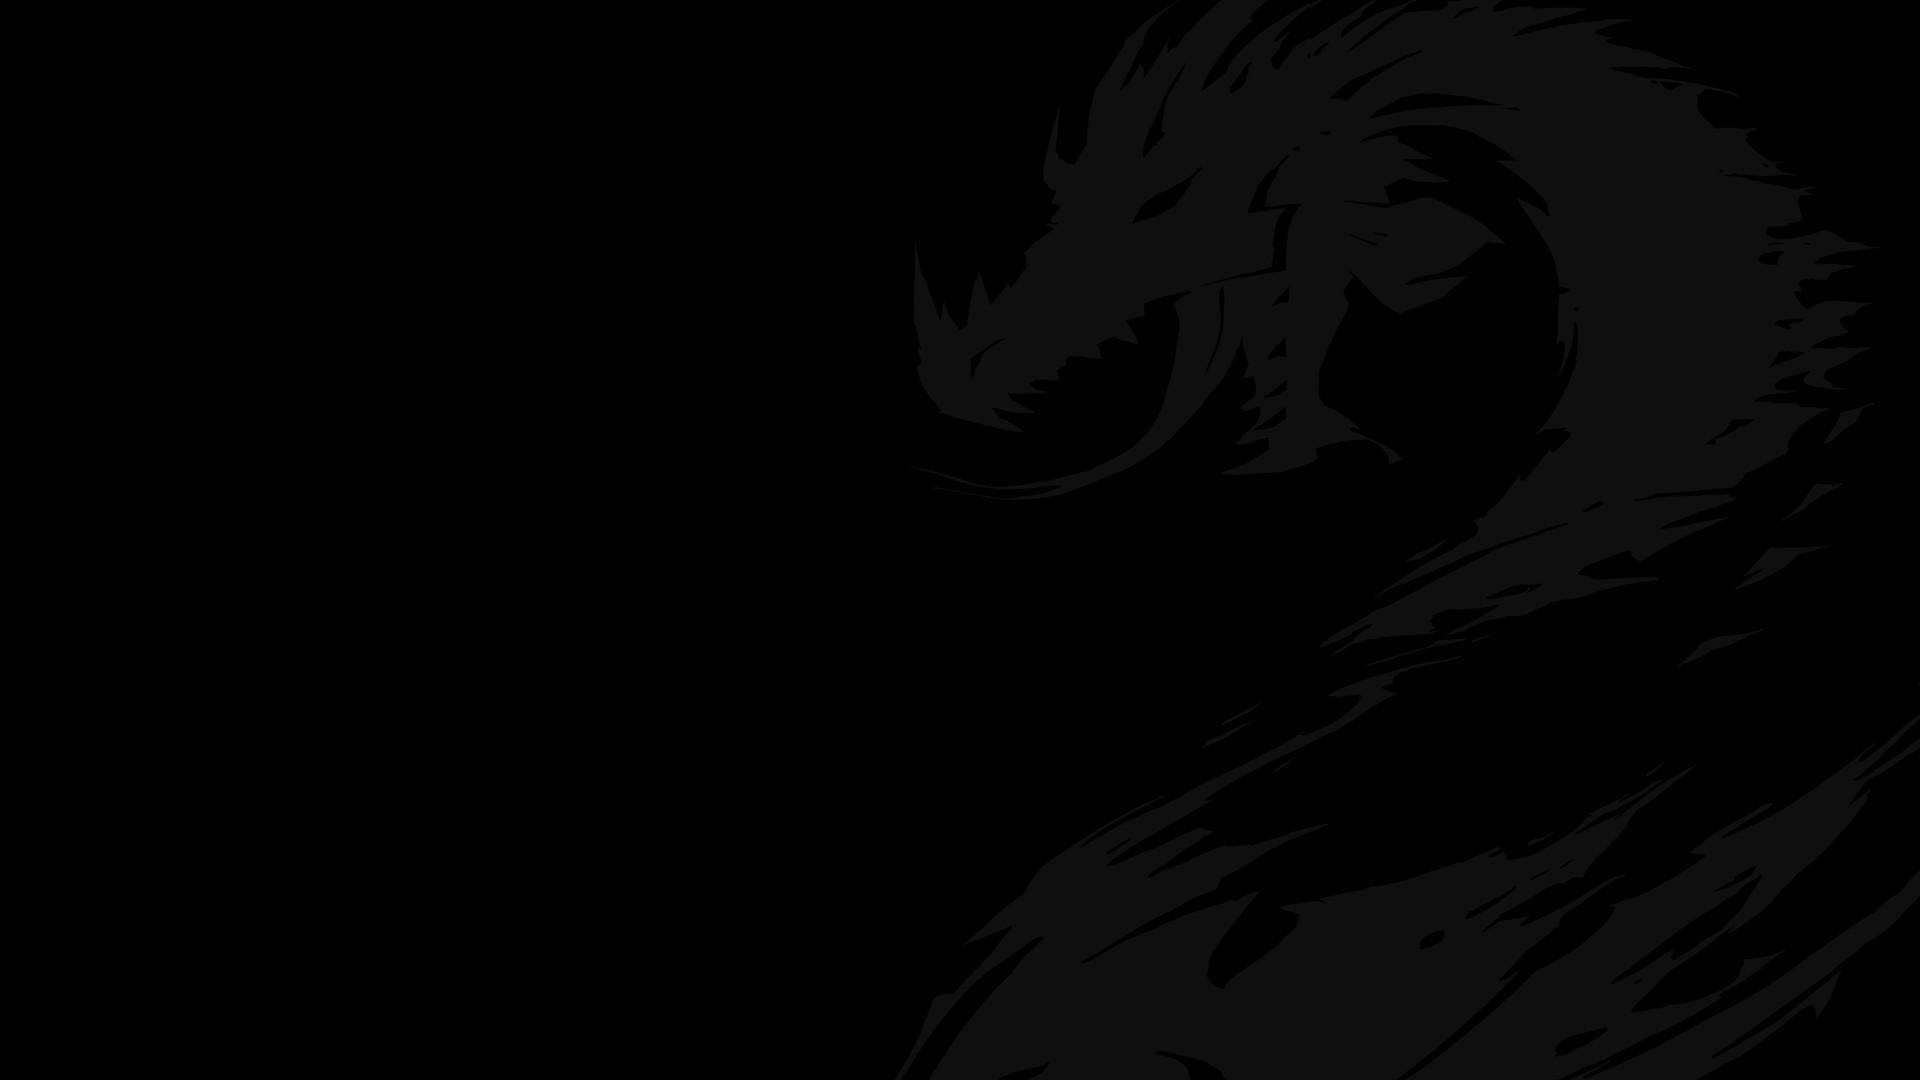 Solid Black Wallpaper   wallpaper, wallpaper hd, background desktop